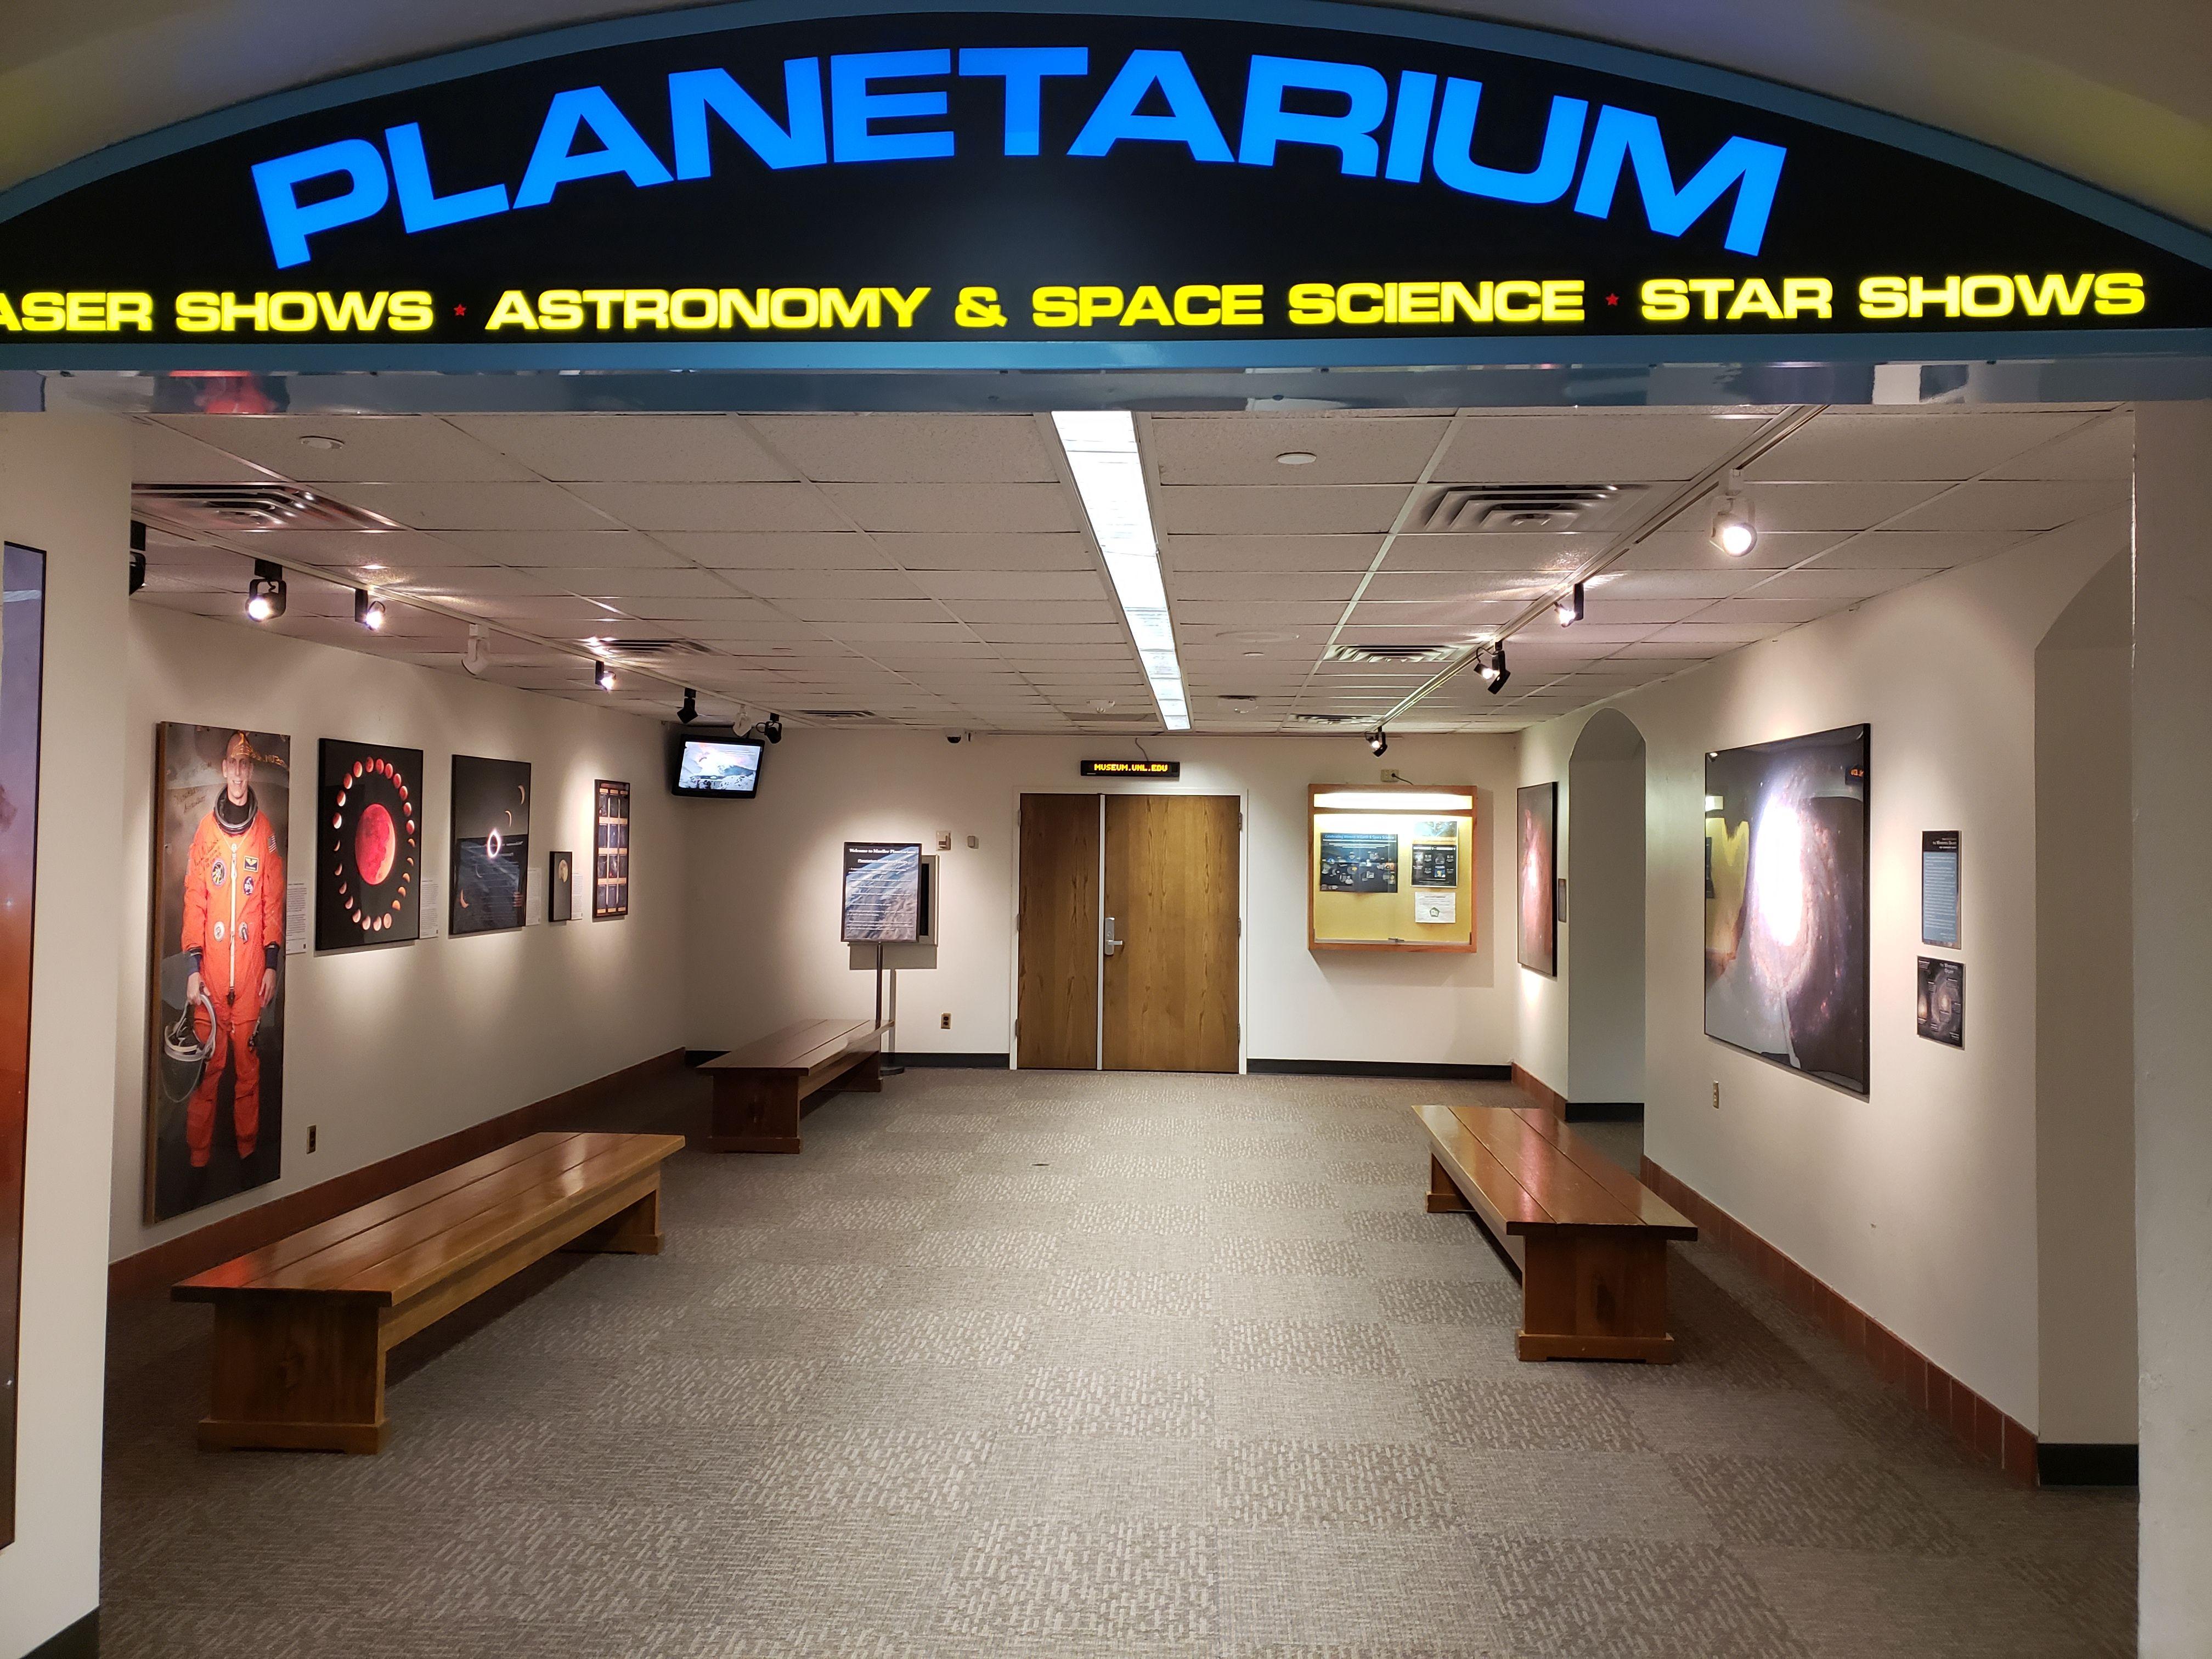 Planetarium lobby today